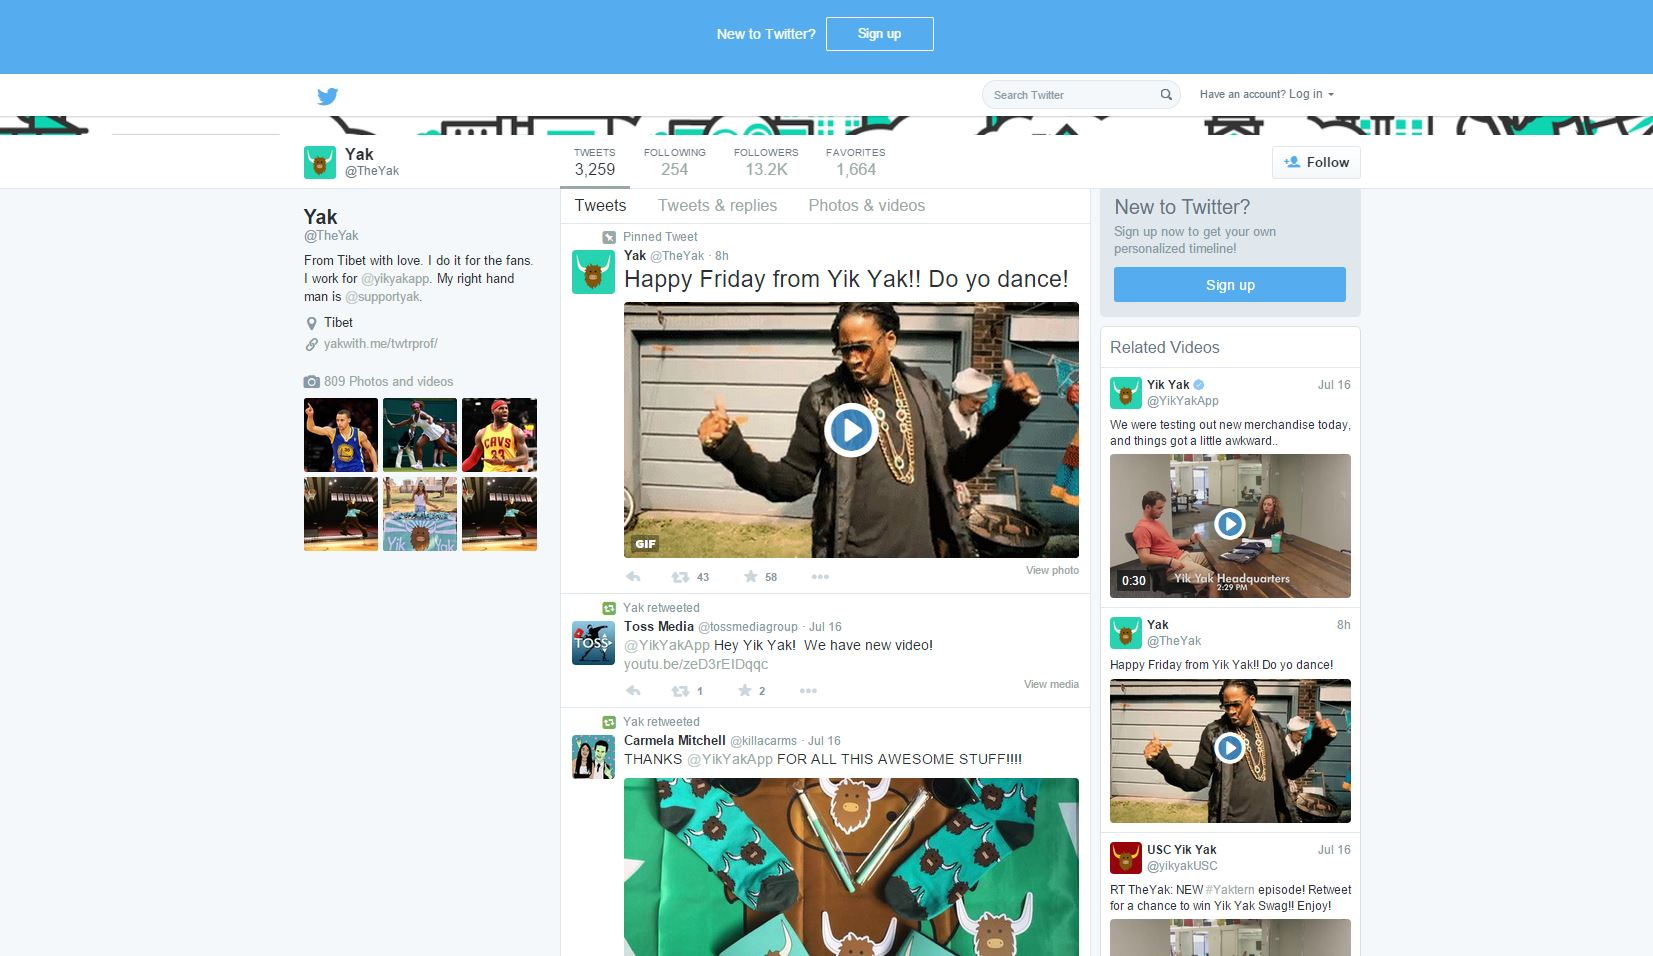 twitter related videos yik yak profile